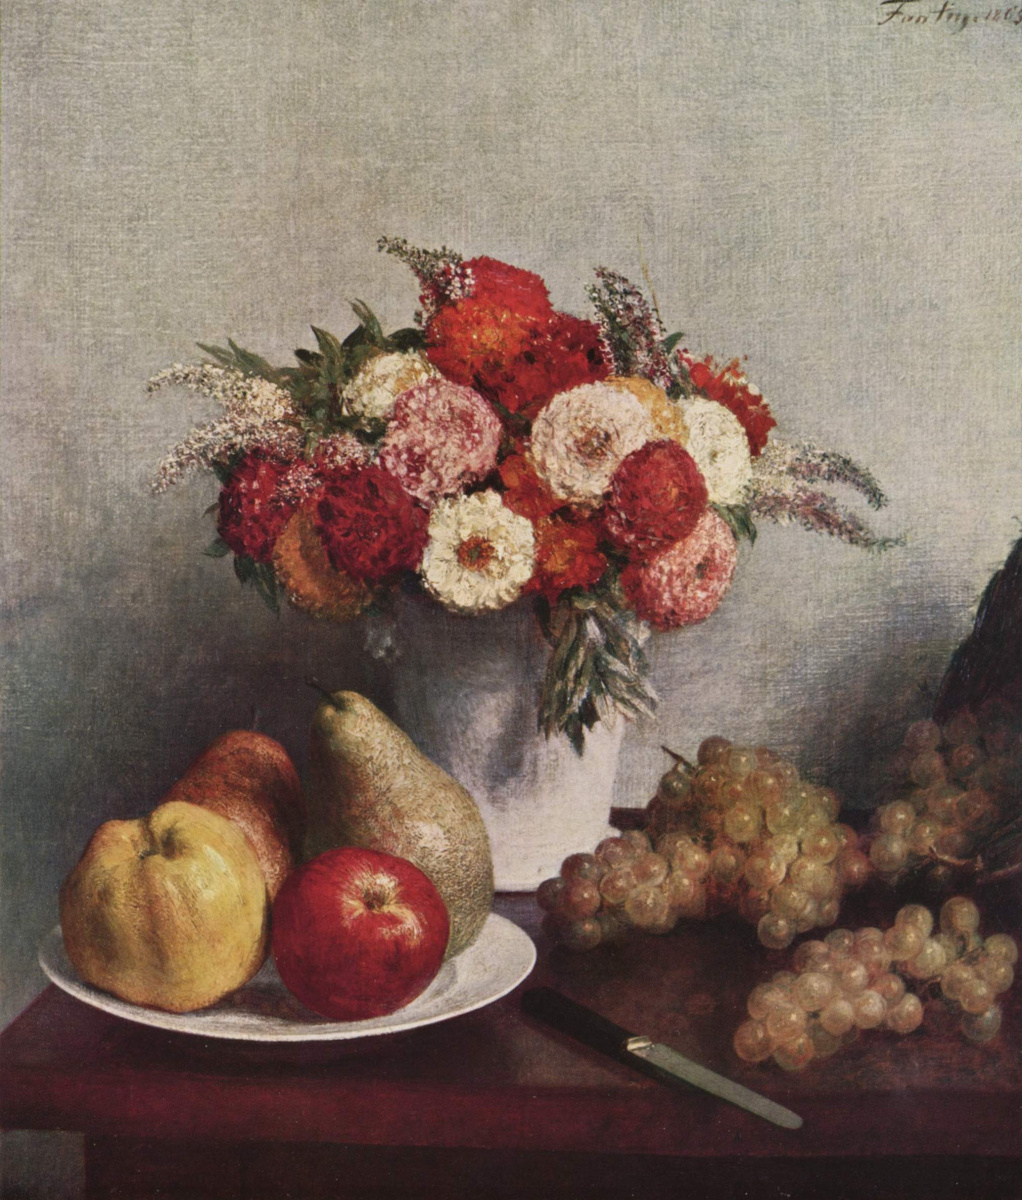 Henri Fantin-Latour. Flowers and fruits